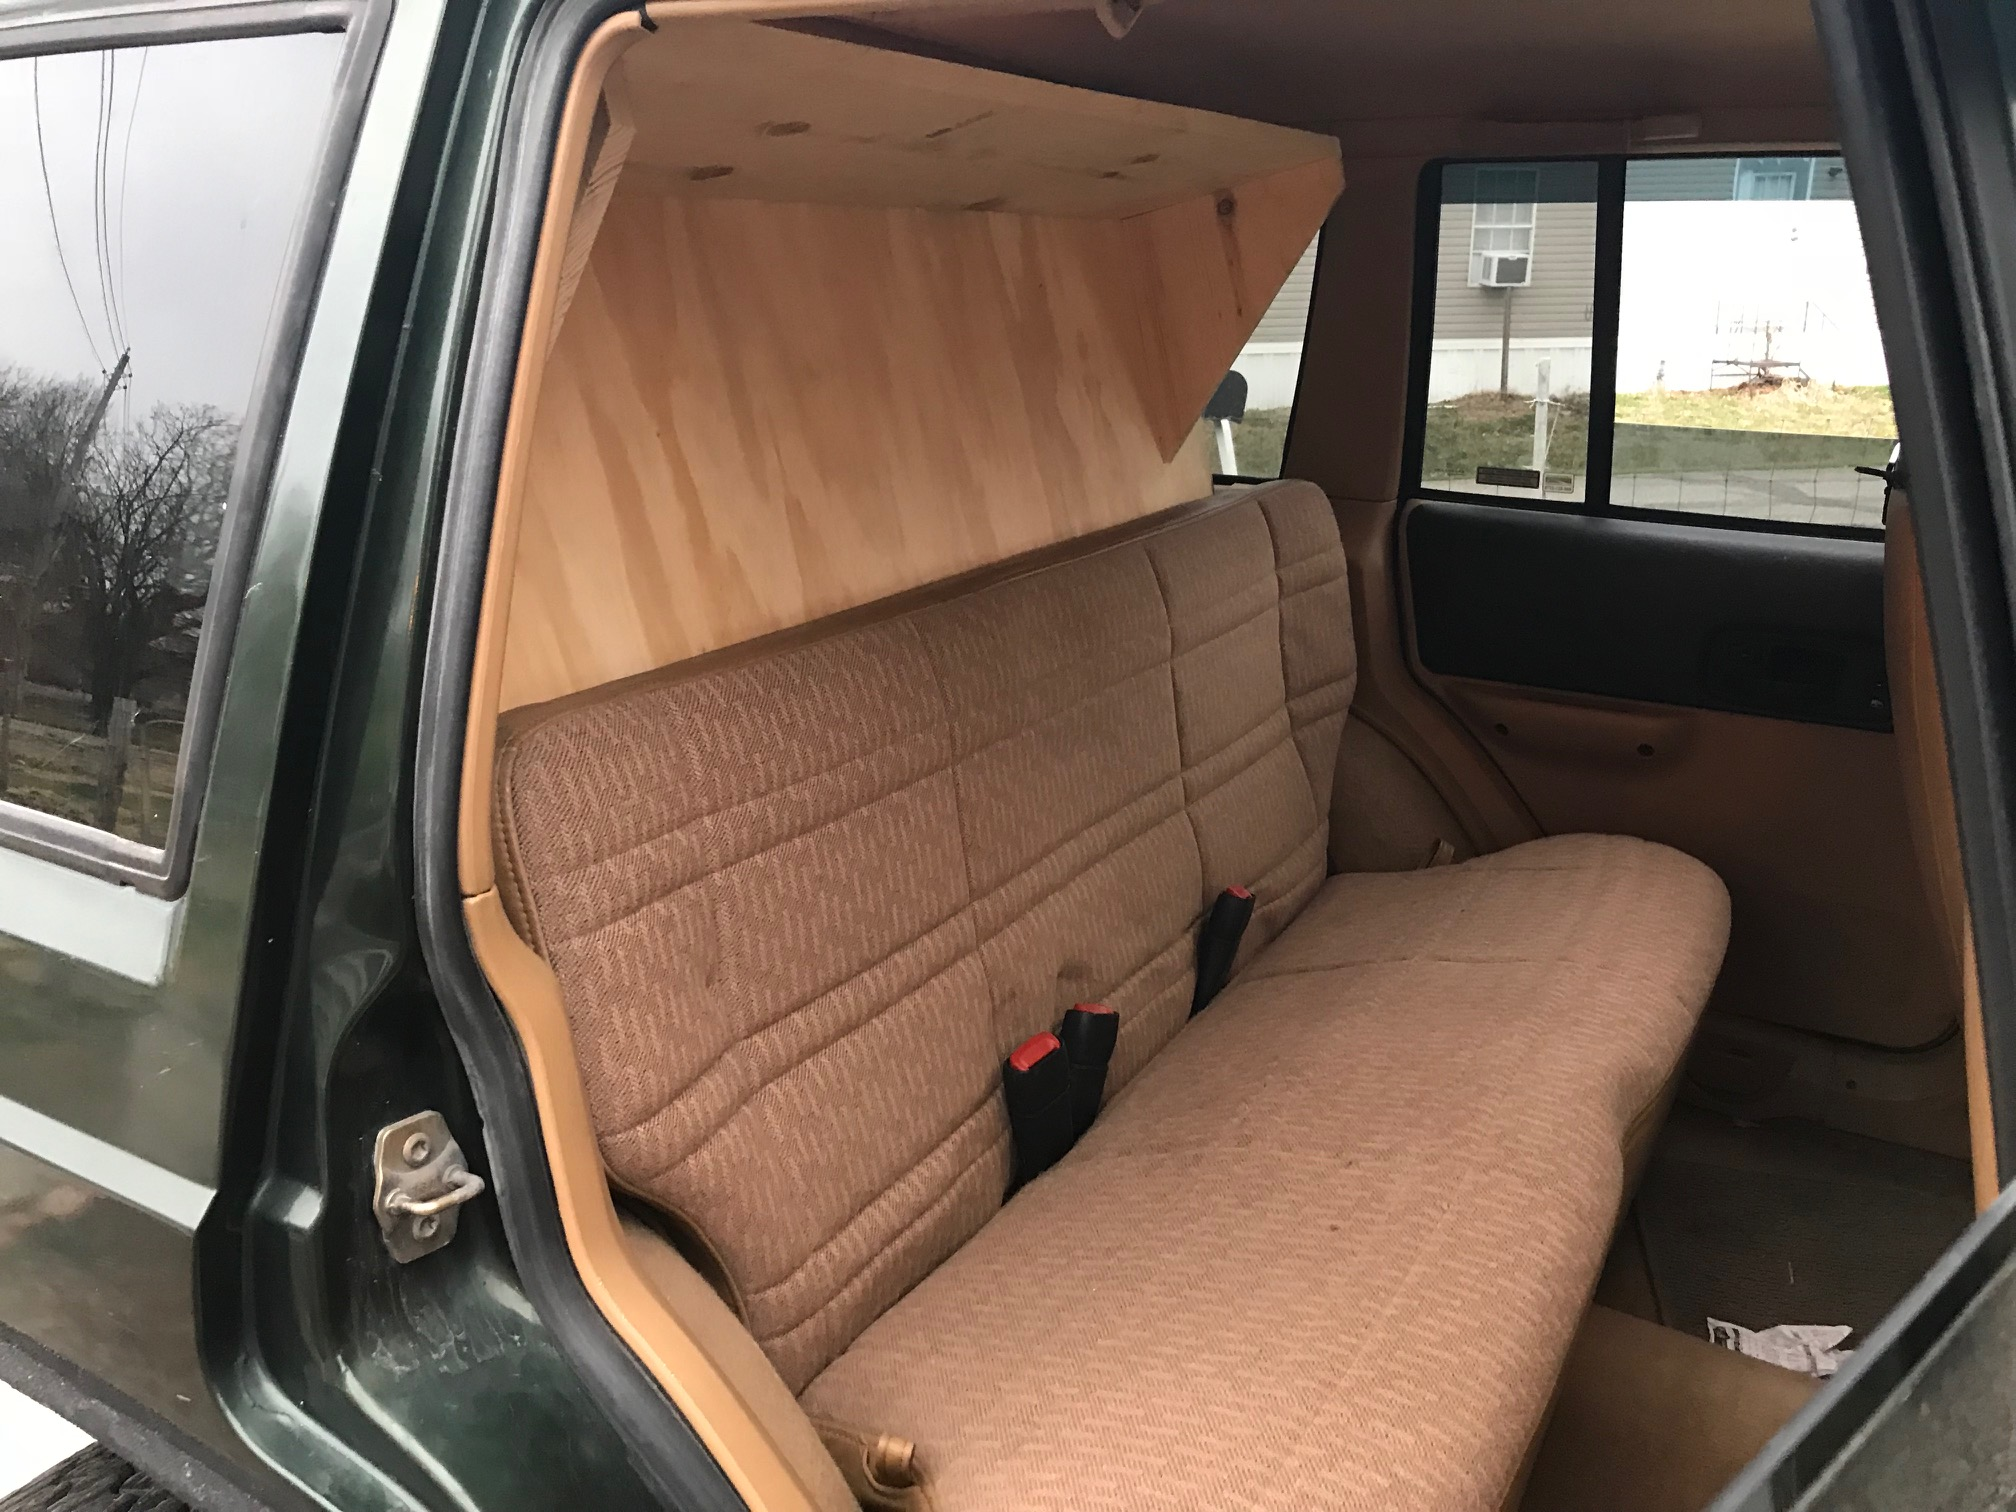 jeep xj cherokee cargo storage sleeping platform folding rear seat